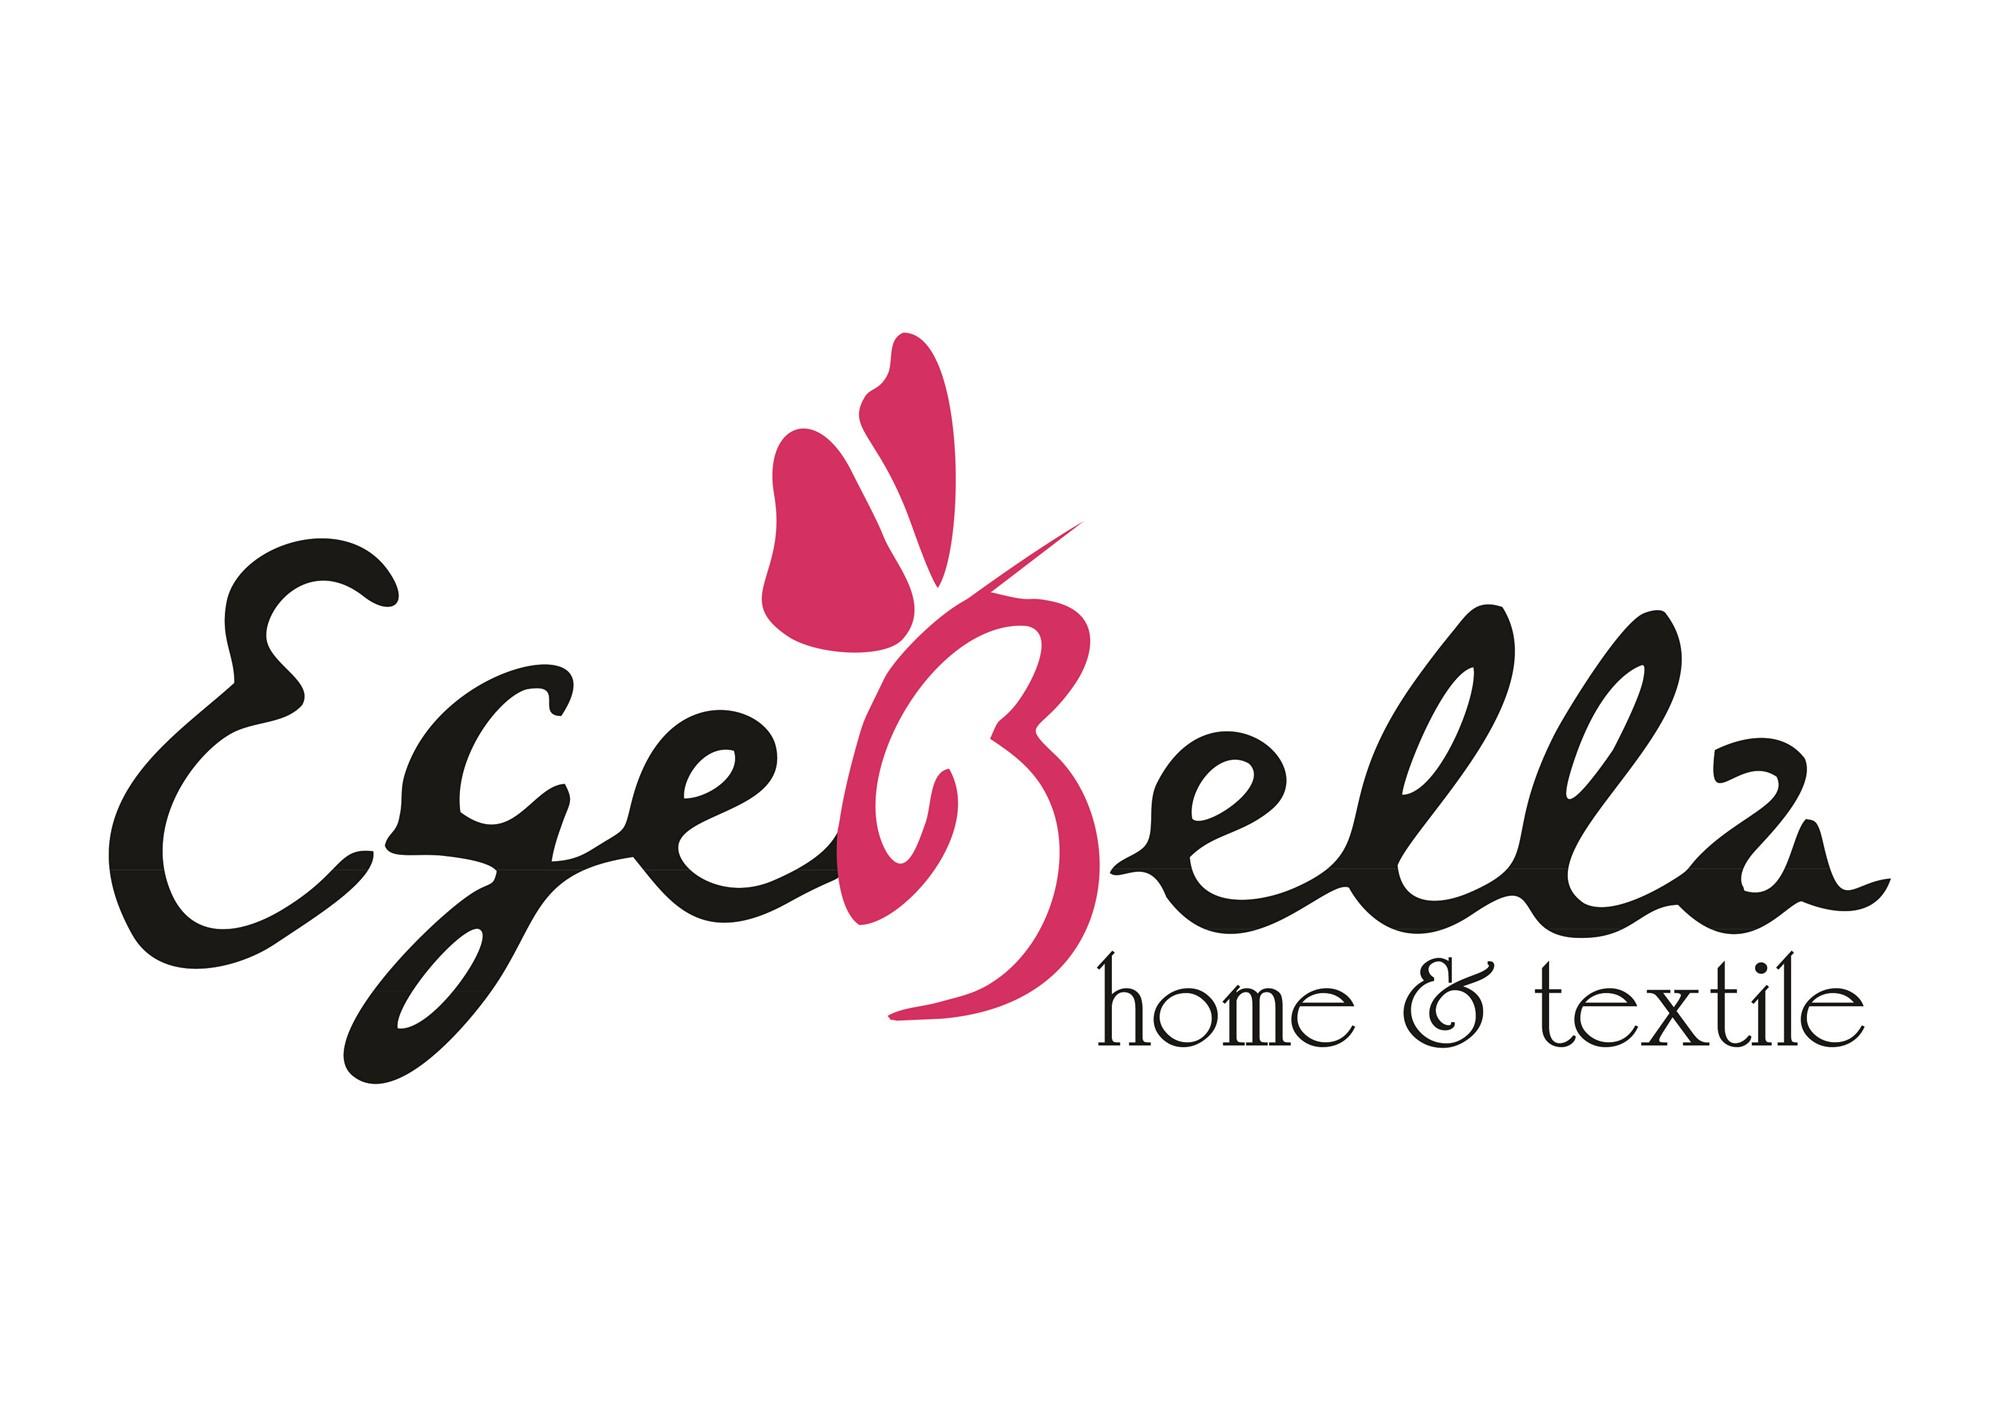 Egebella